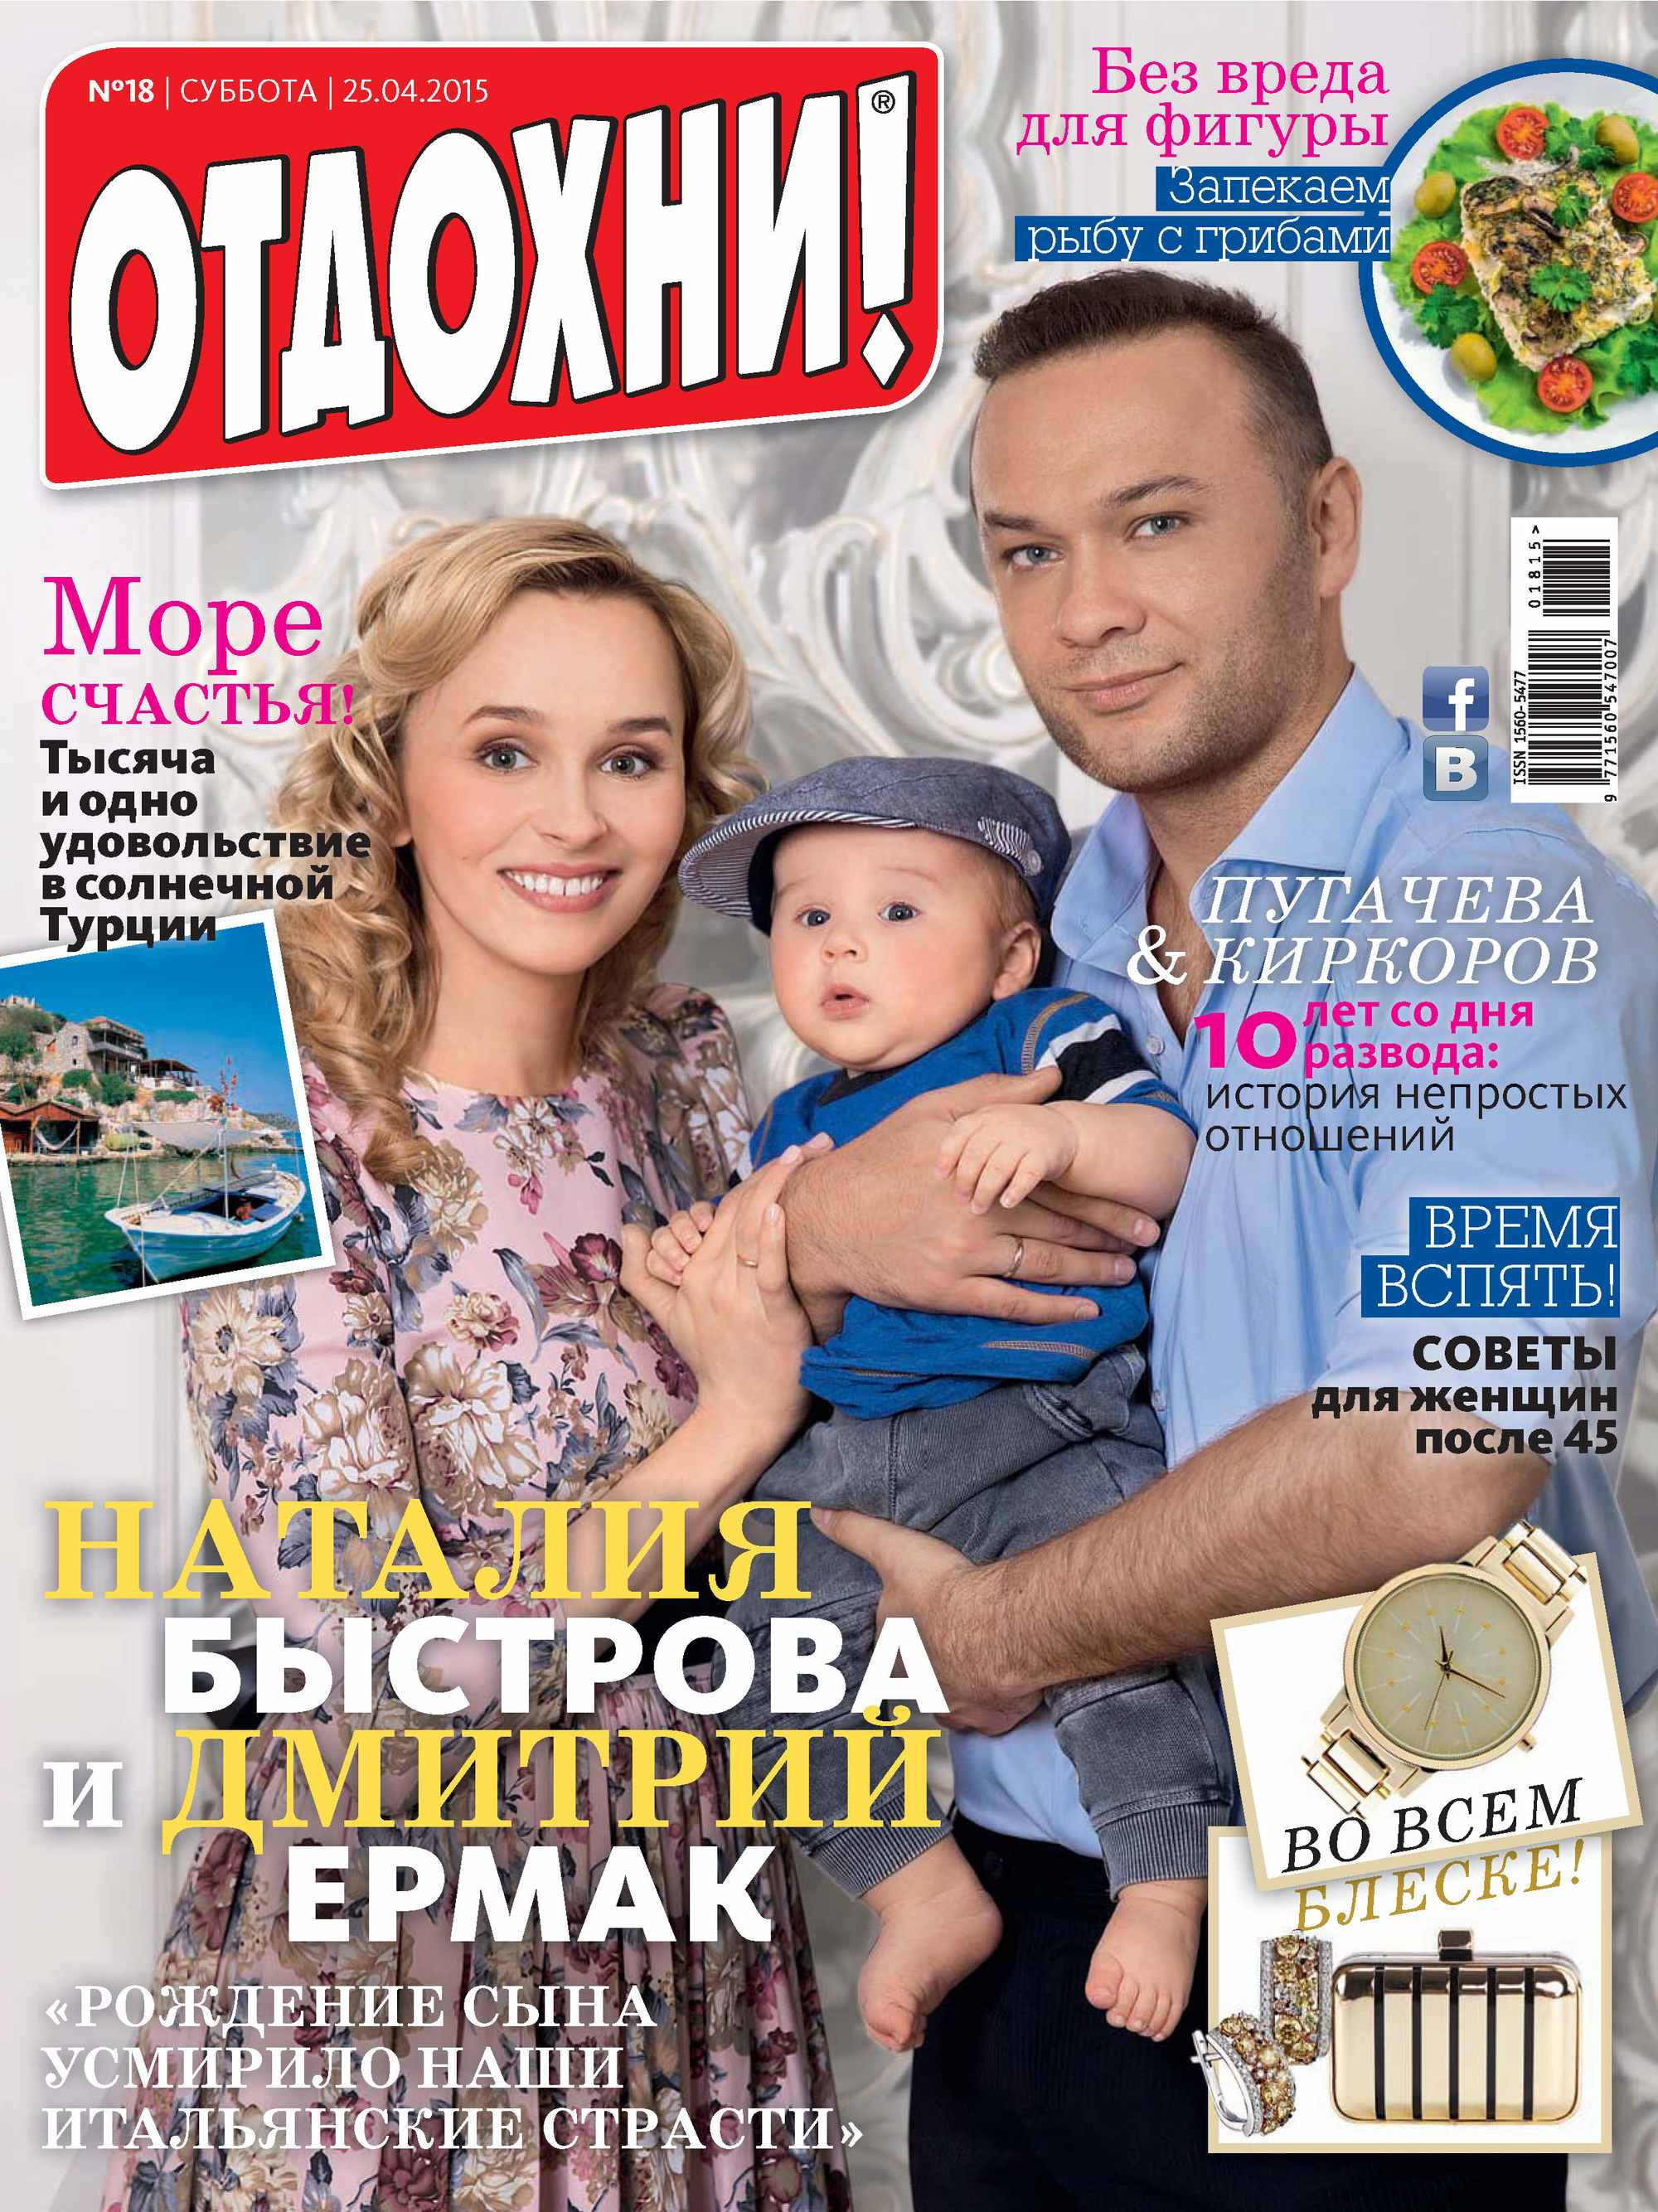 ИД «Бурда» Журнал «Отдохни!» №18/2015 ид бурда журнал отдохни 12 2015